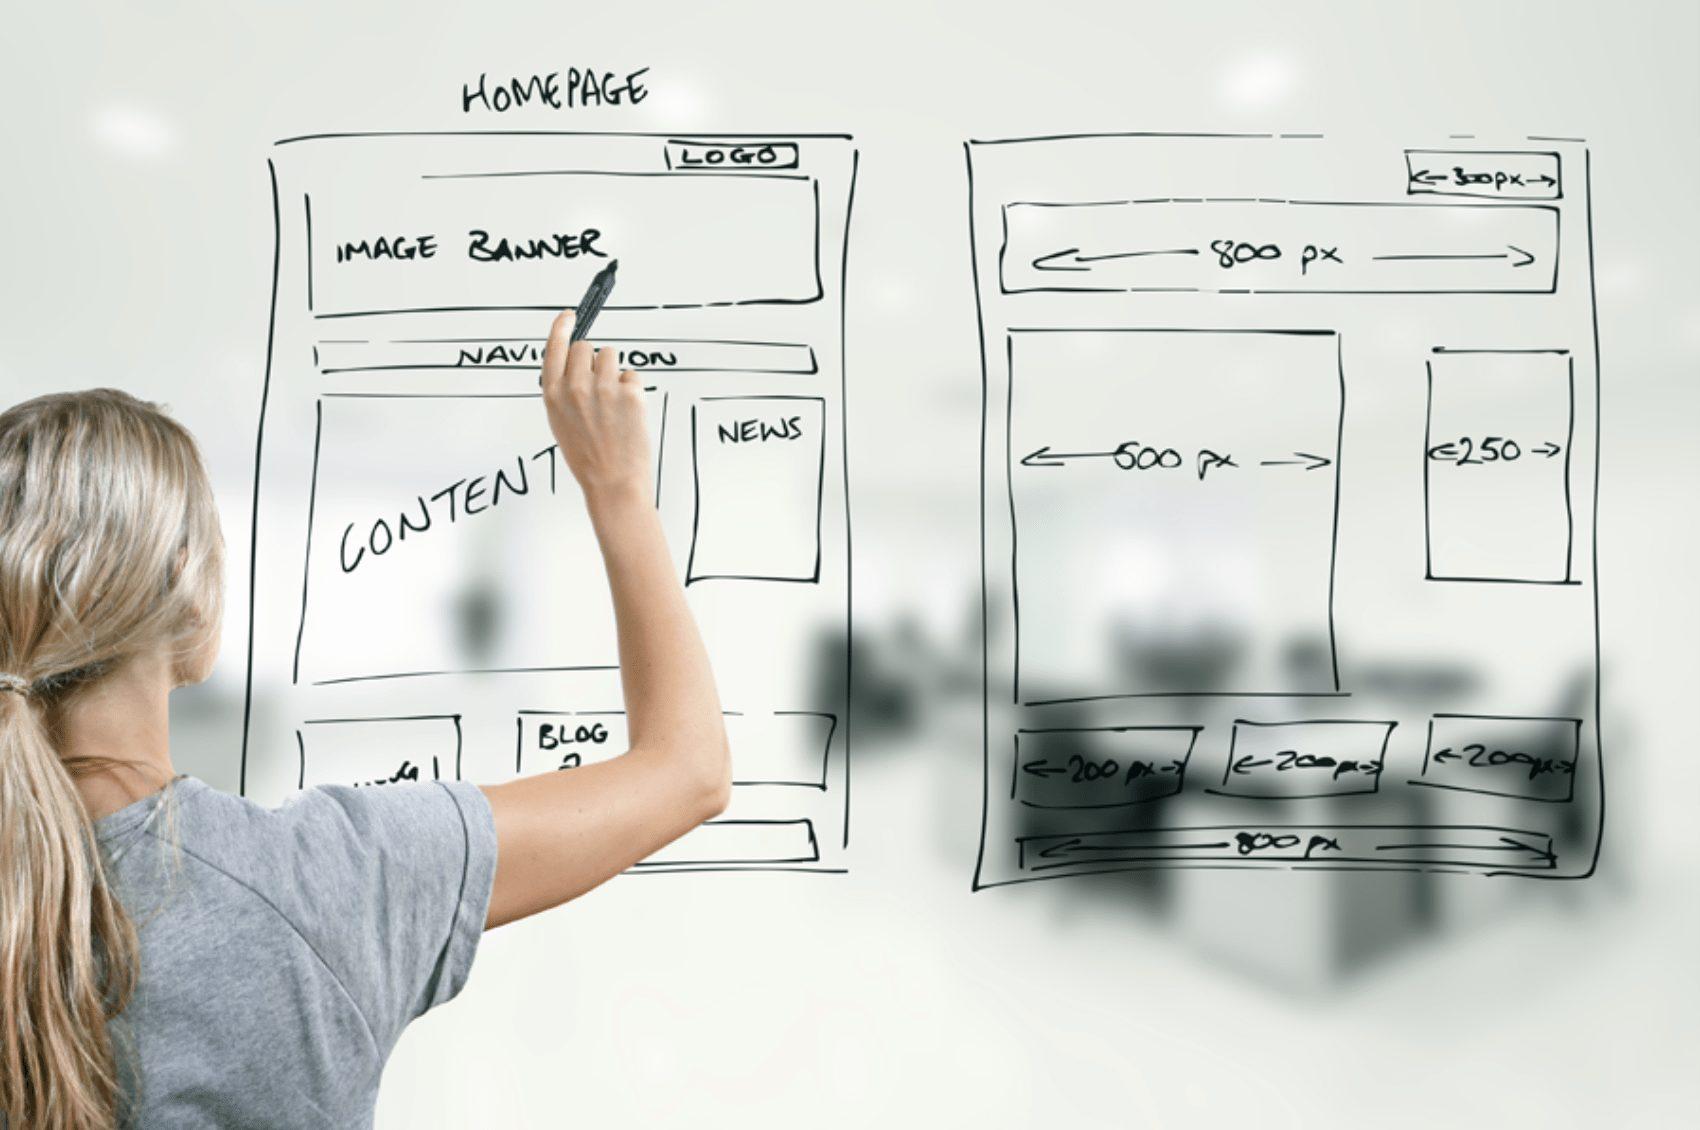 16 Tips For Choosing A Web Design Company - Web Design Ideas- Spade Design